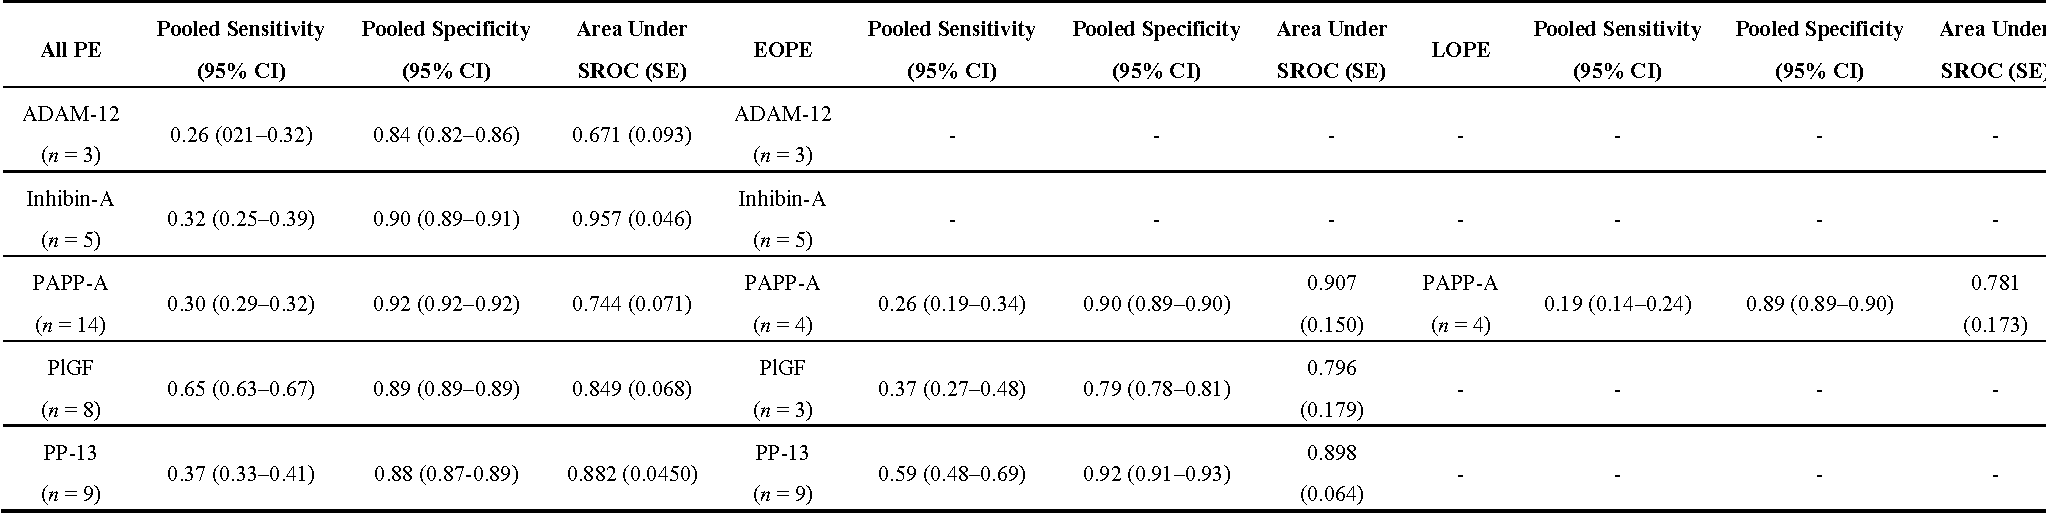 Table 2. Meta-analyses of single laboratory biomarkers.